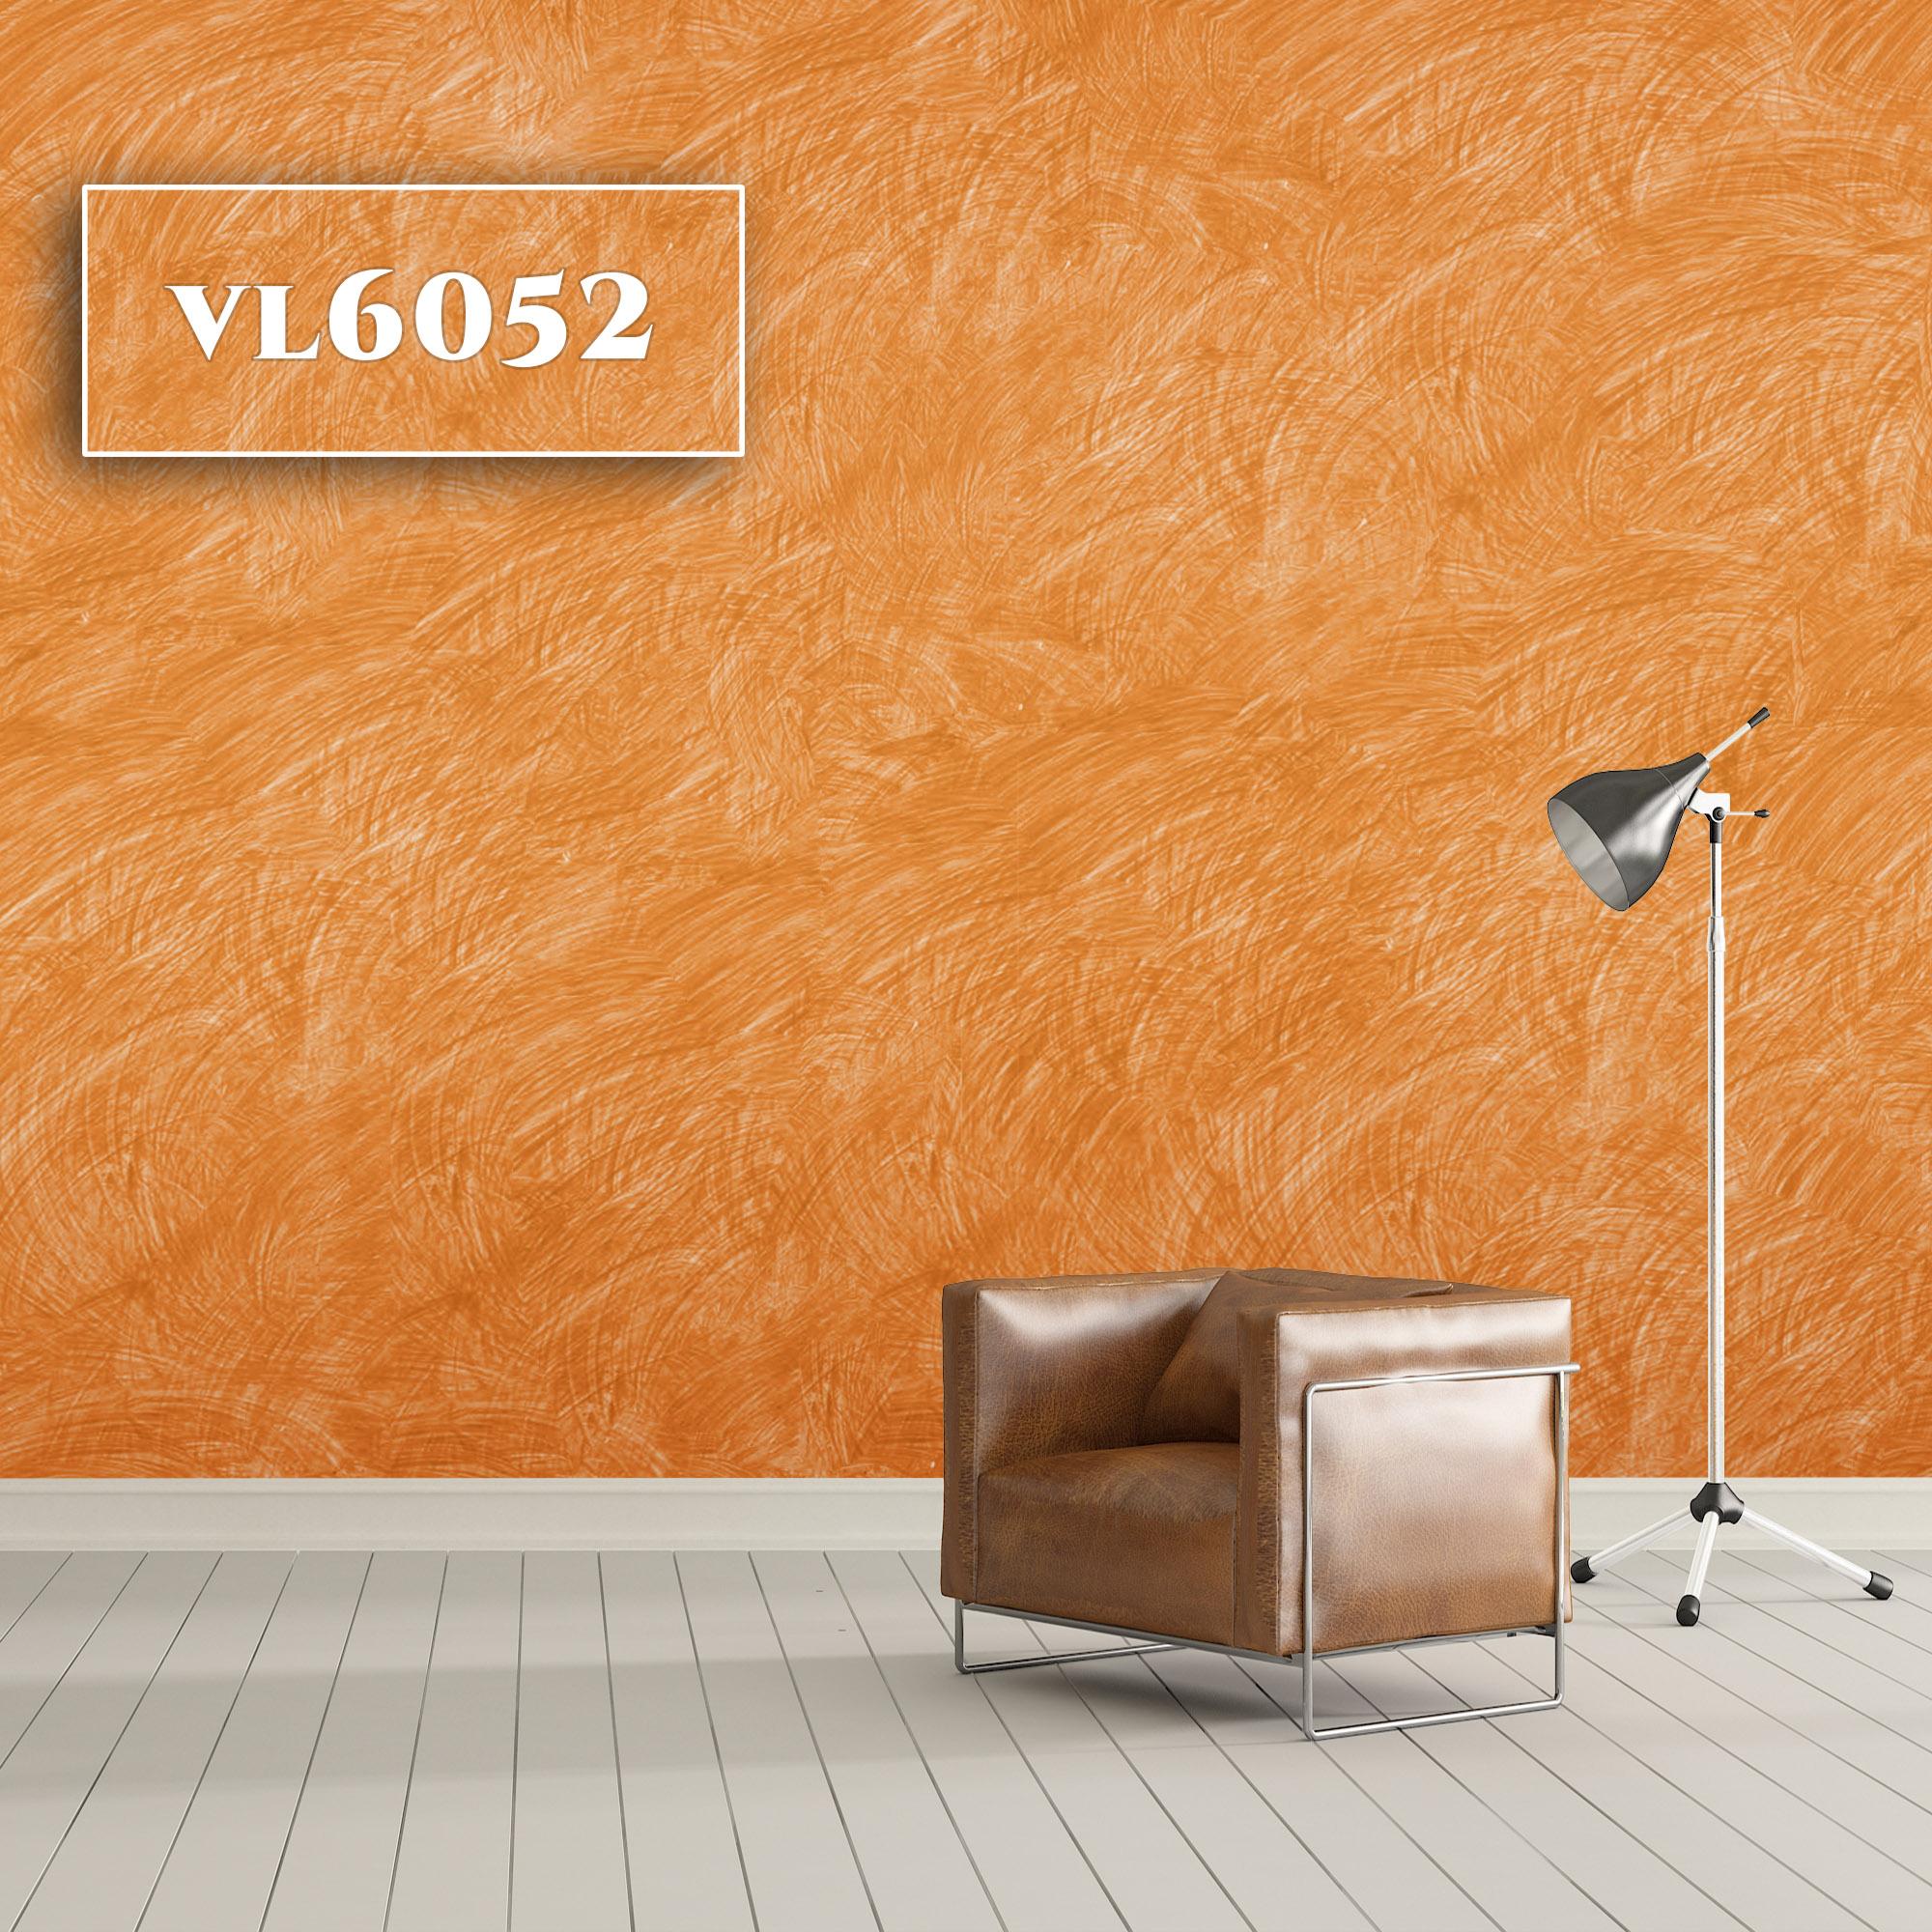 VL6052